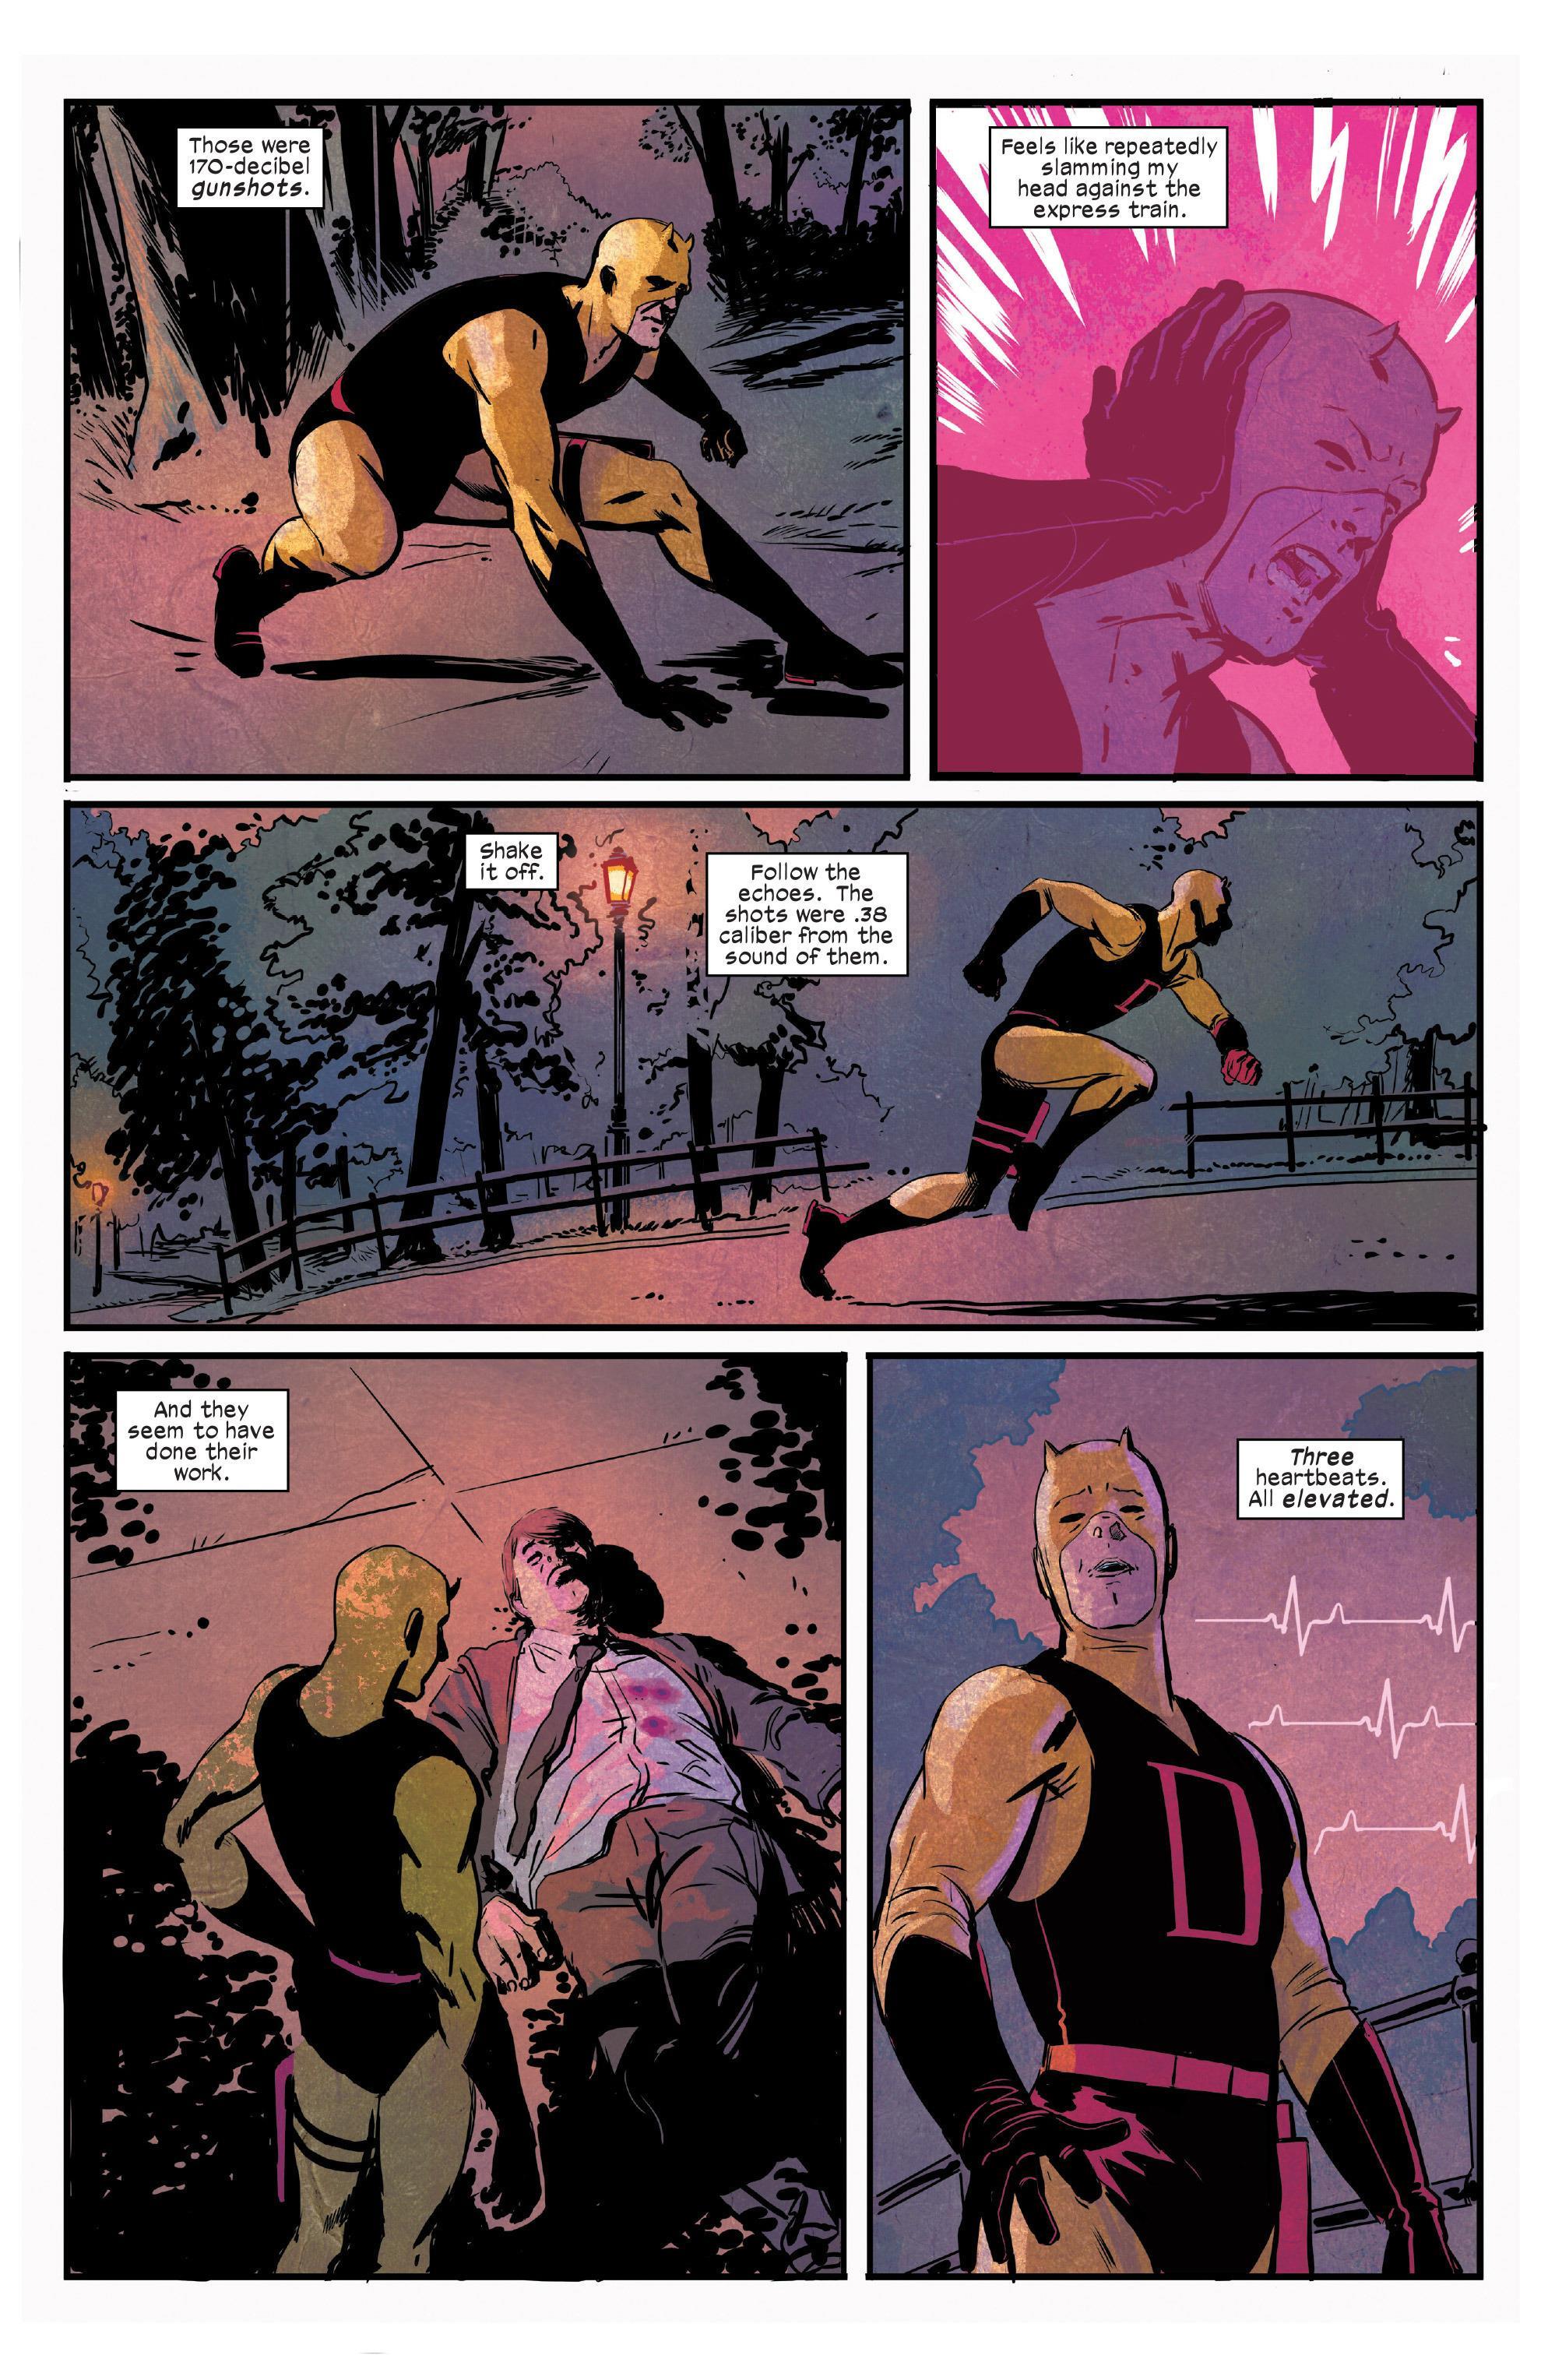 Daredevil - The Autobiography of Matt Murdock review